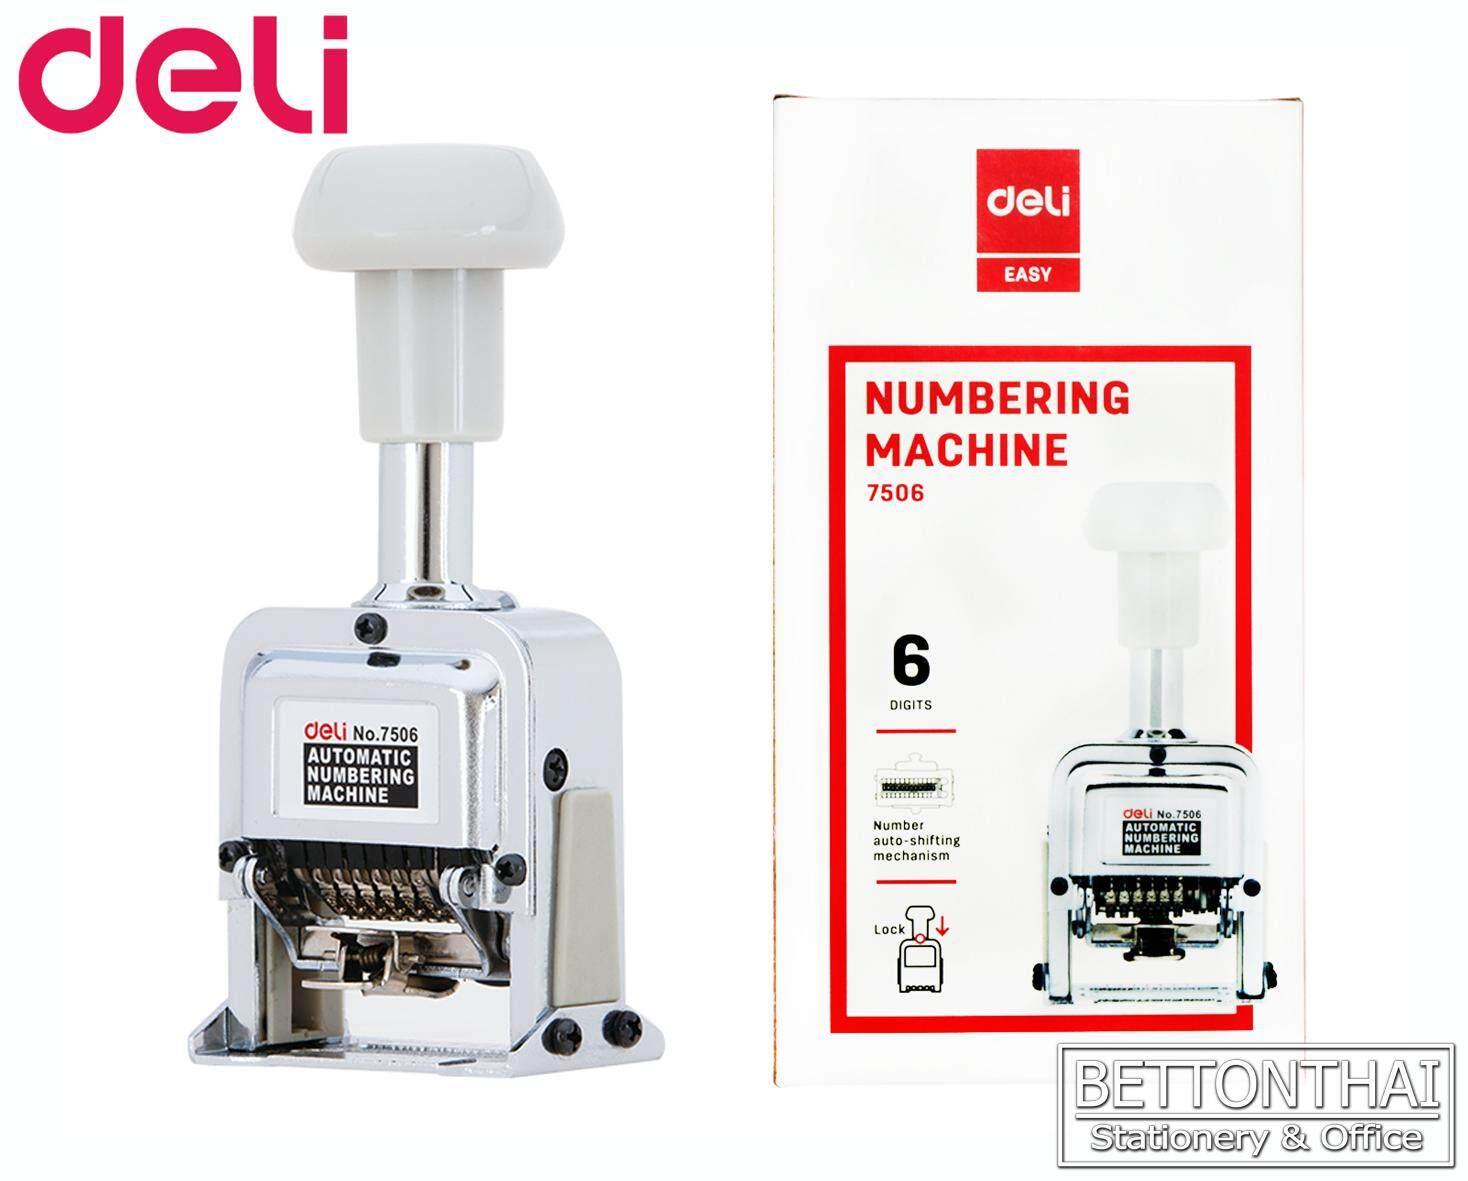 Numbering Machine เครื่องรันนัมเบอร์ 6 หลัก ยี่ห้อ Deli รุ่น Dl 7506.